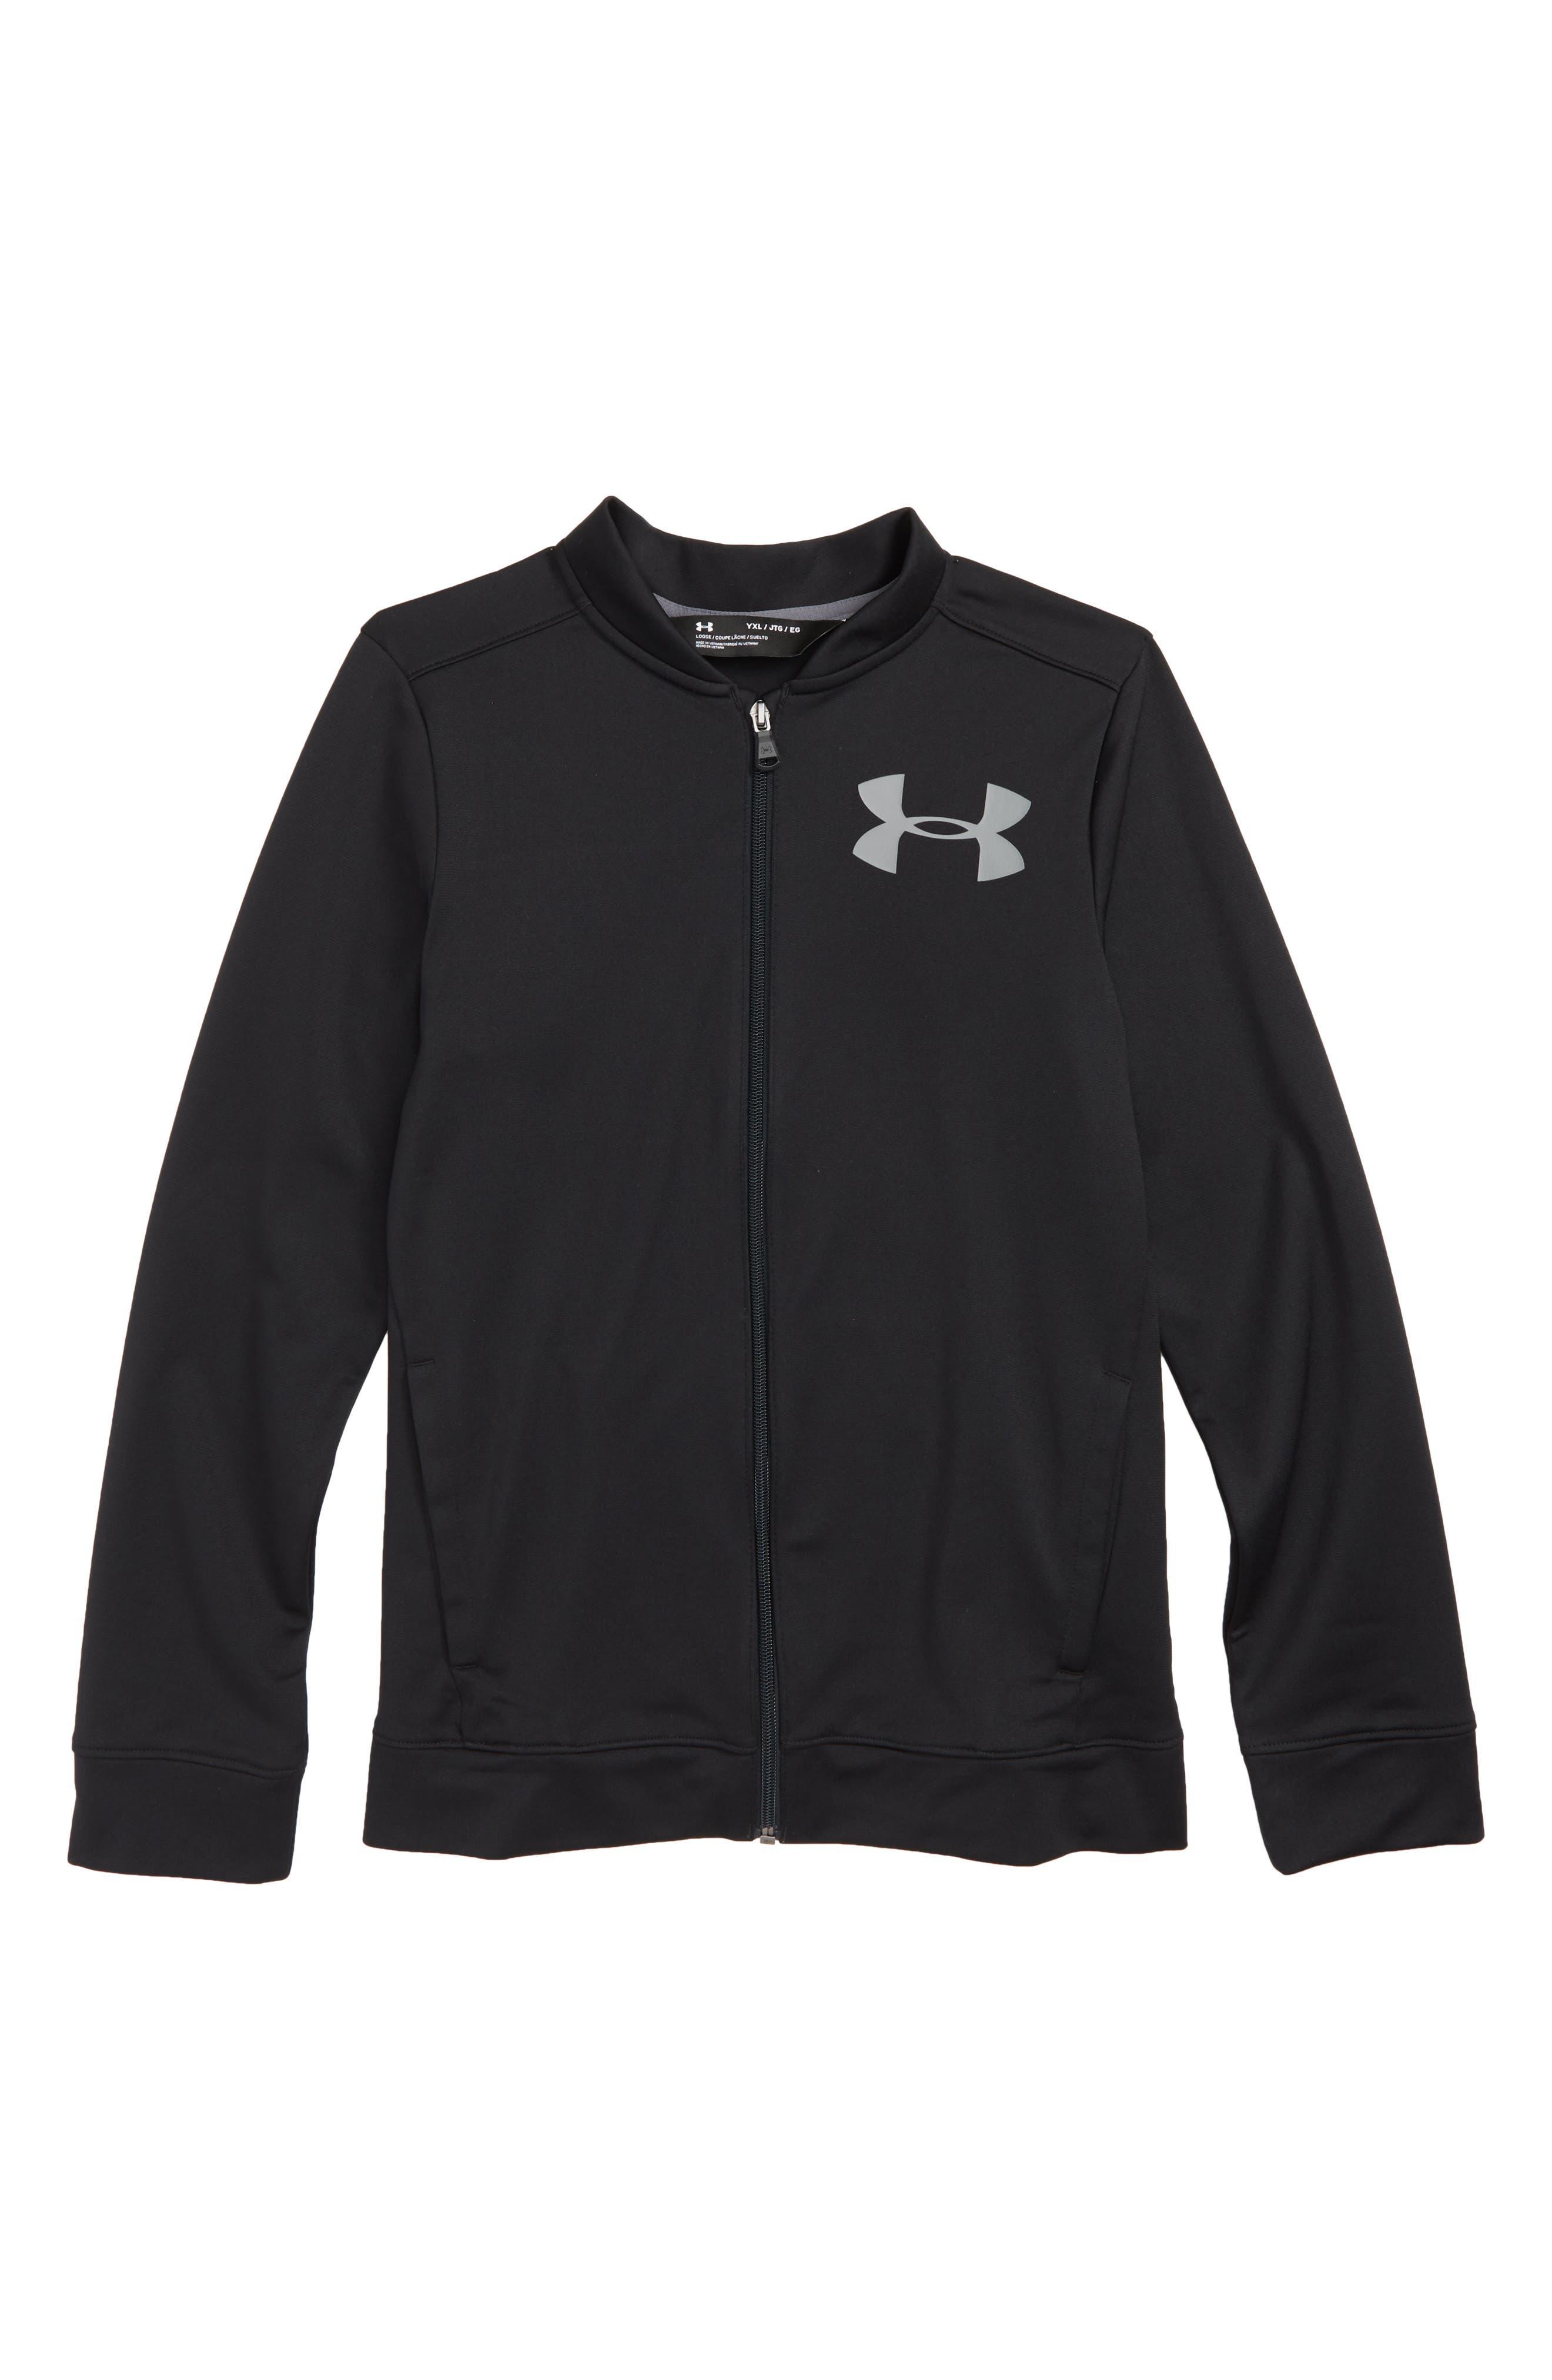 Pennant 2.0 Jacket,                         Main,                         color, BLACK / / GRAPHITE